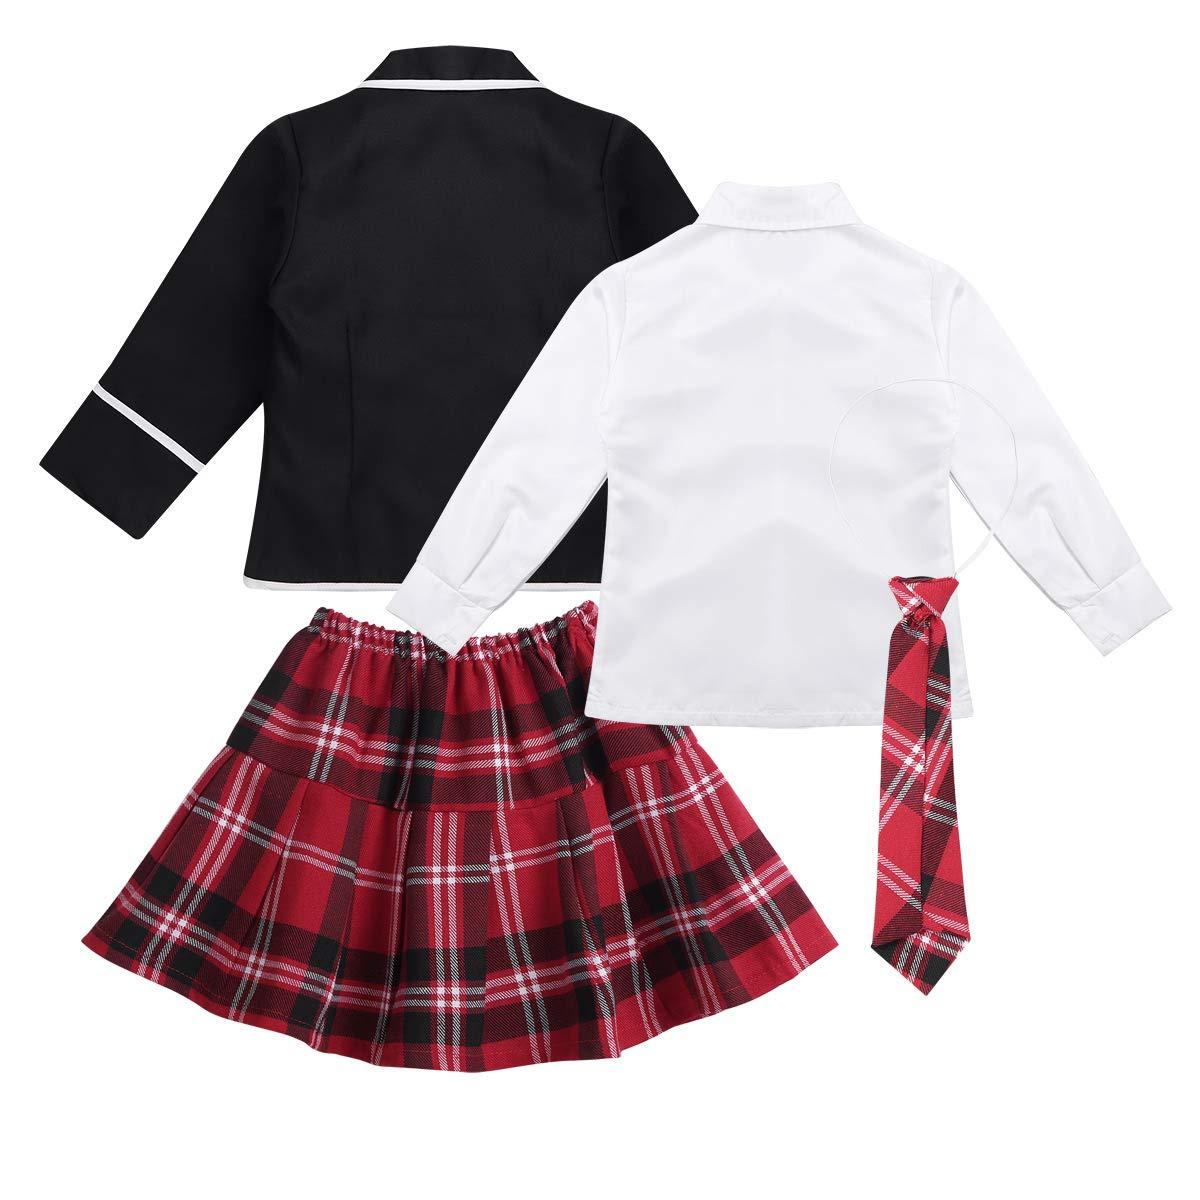 ACSUSS Kids Girls Autumn Winter School Uniforms Outfits White Button Down Shirt with Tie Plaid Mini Skirt Jacket Set